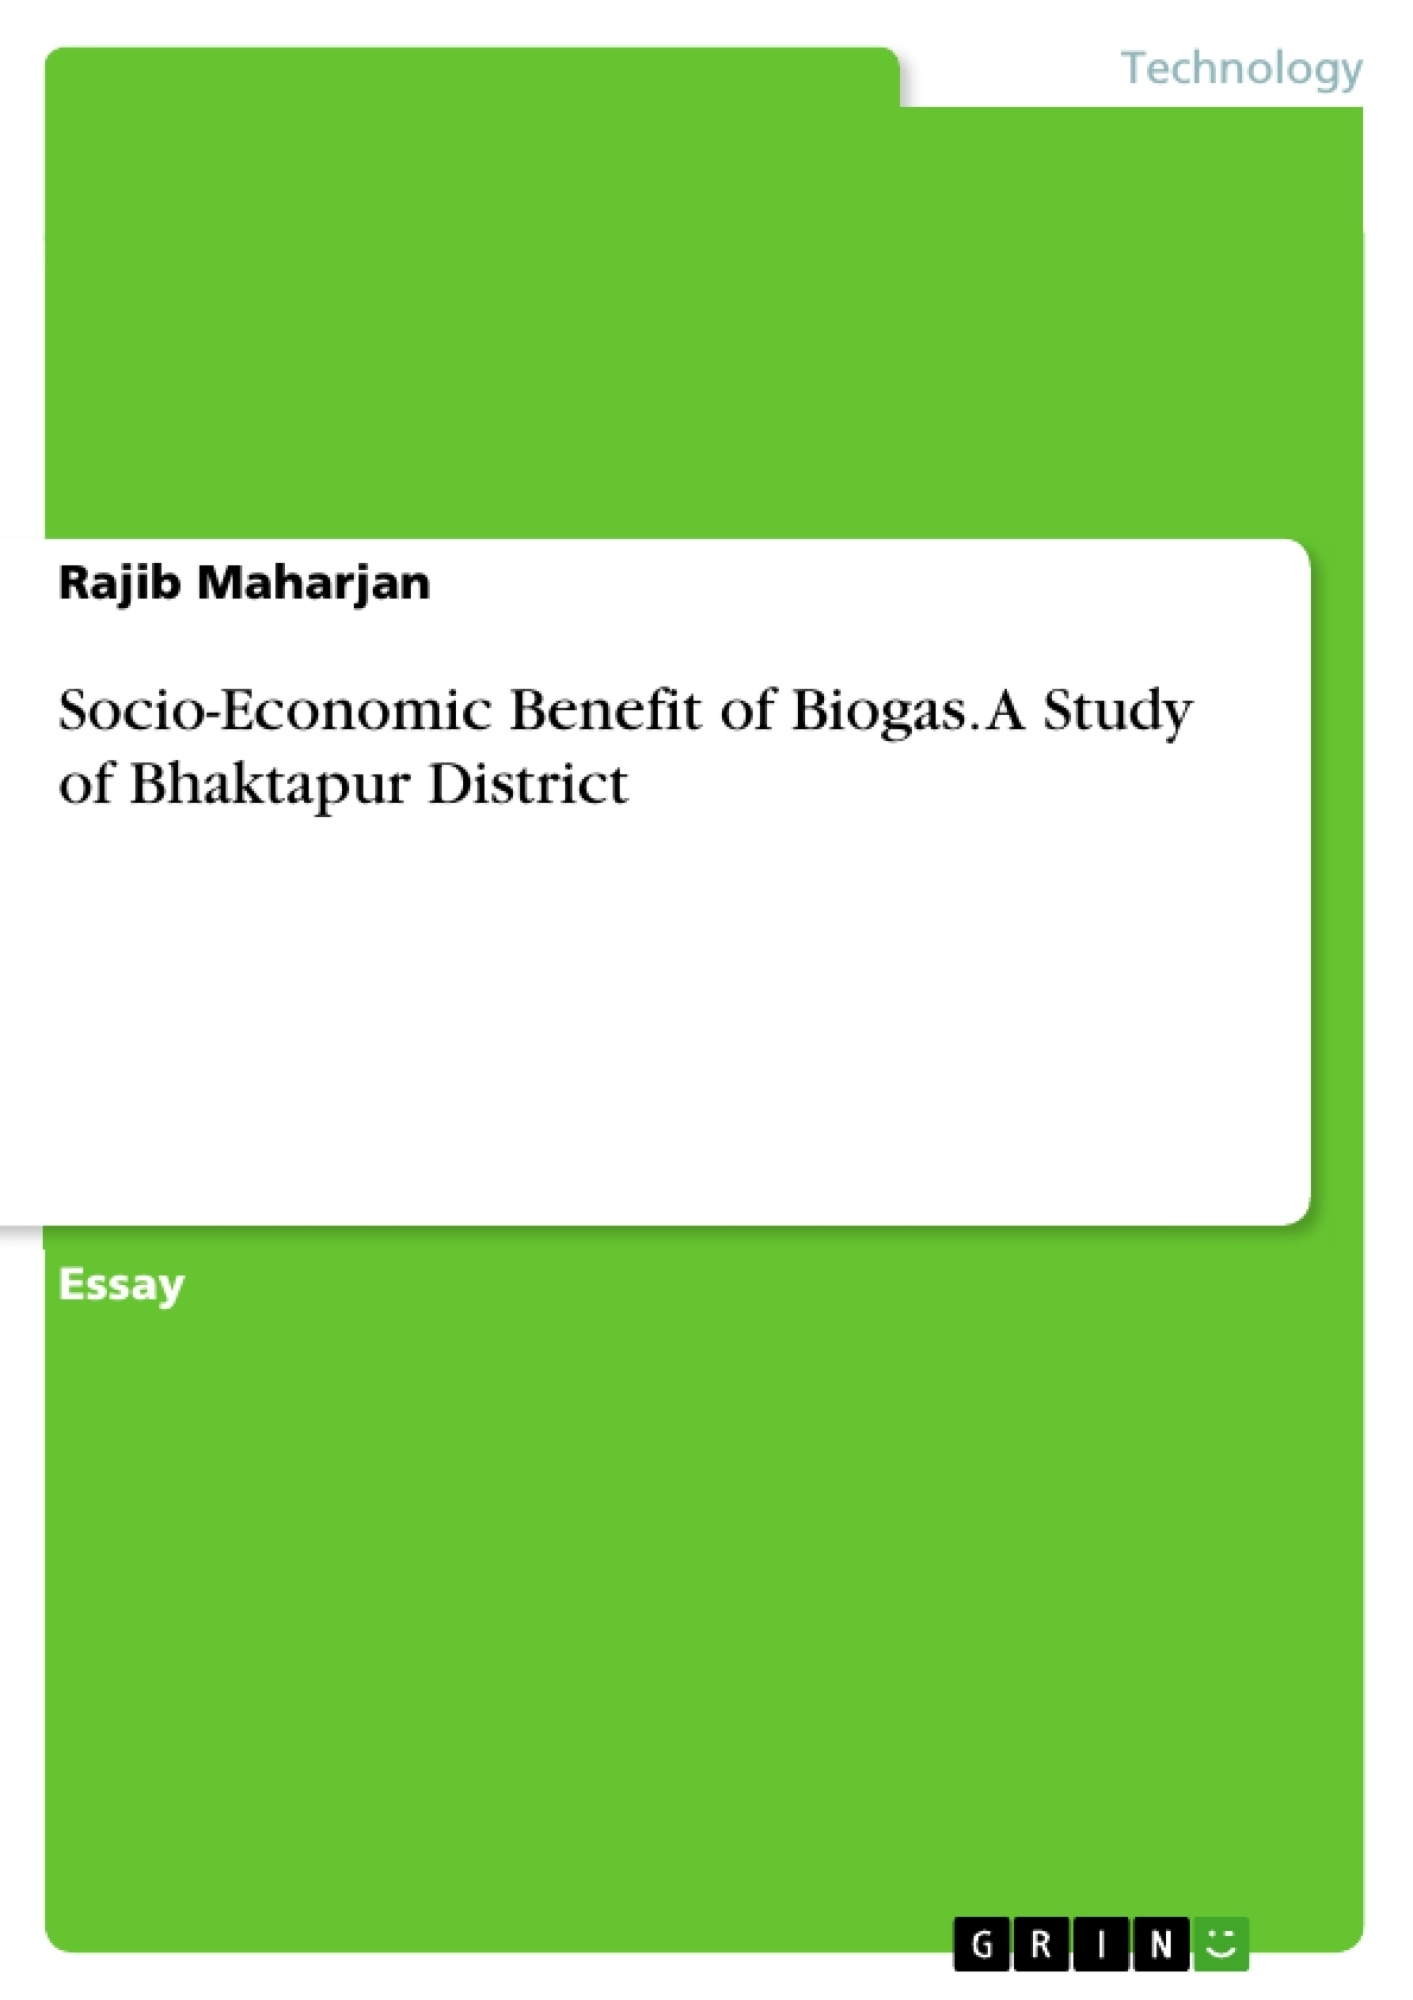 Title: Socio-Economic Benefit of Biogas. A Study of Bhaktapur District